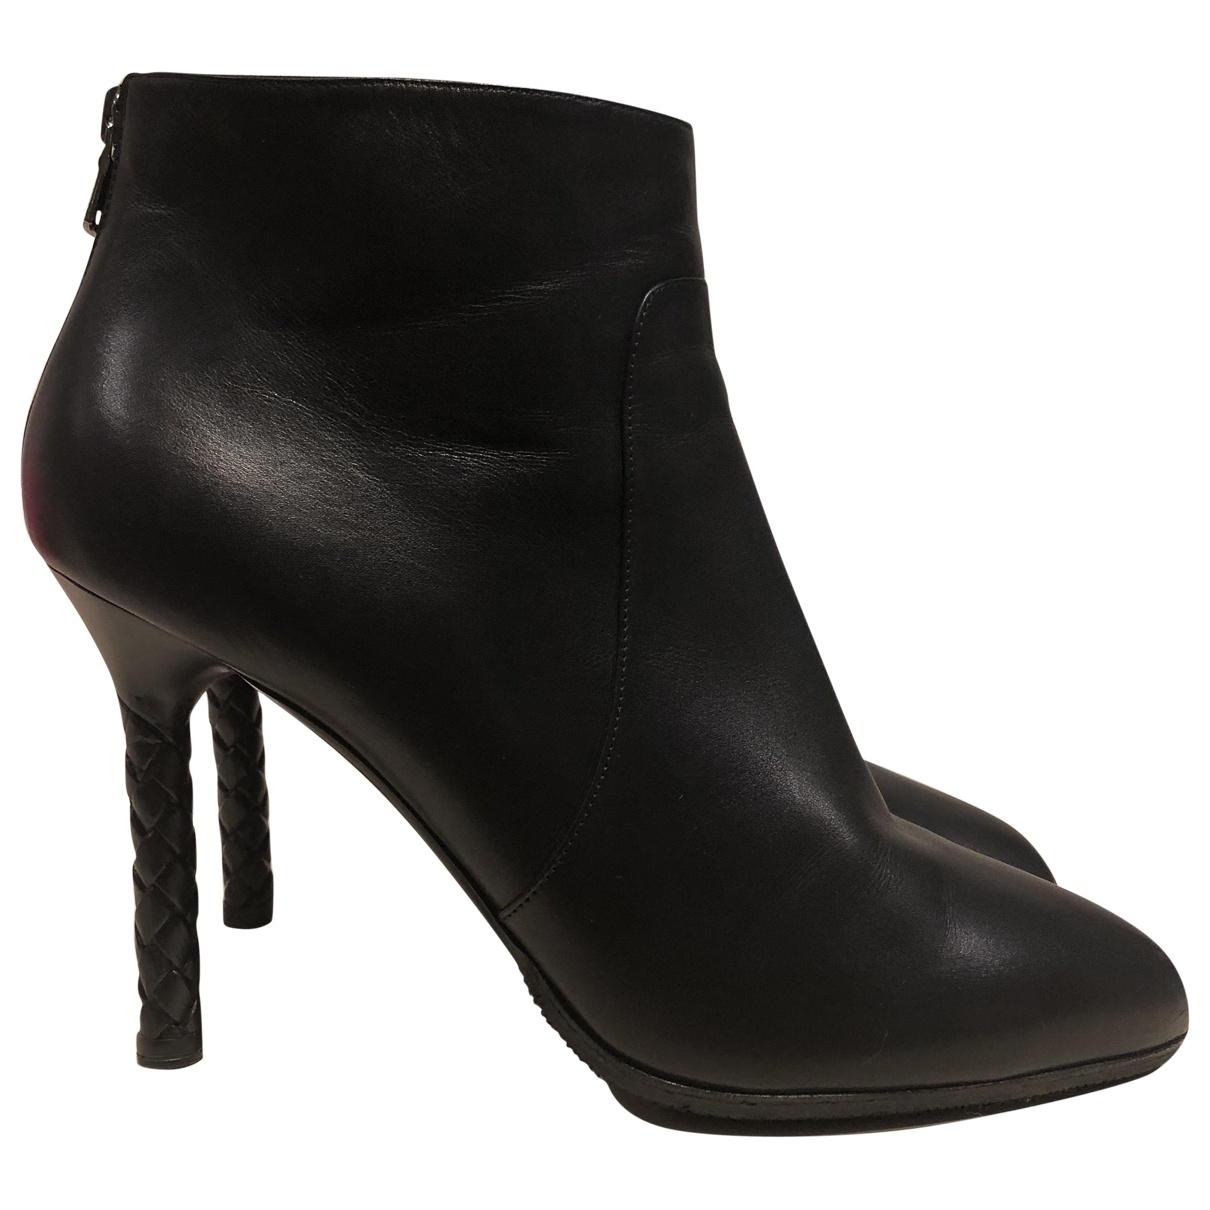 Bottega Veneta \N Black Leather Ankle boots for Women 40.5 EU